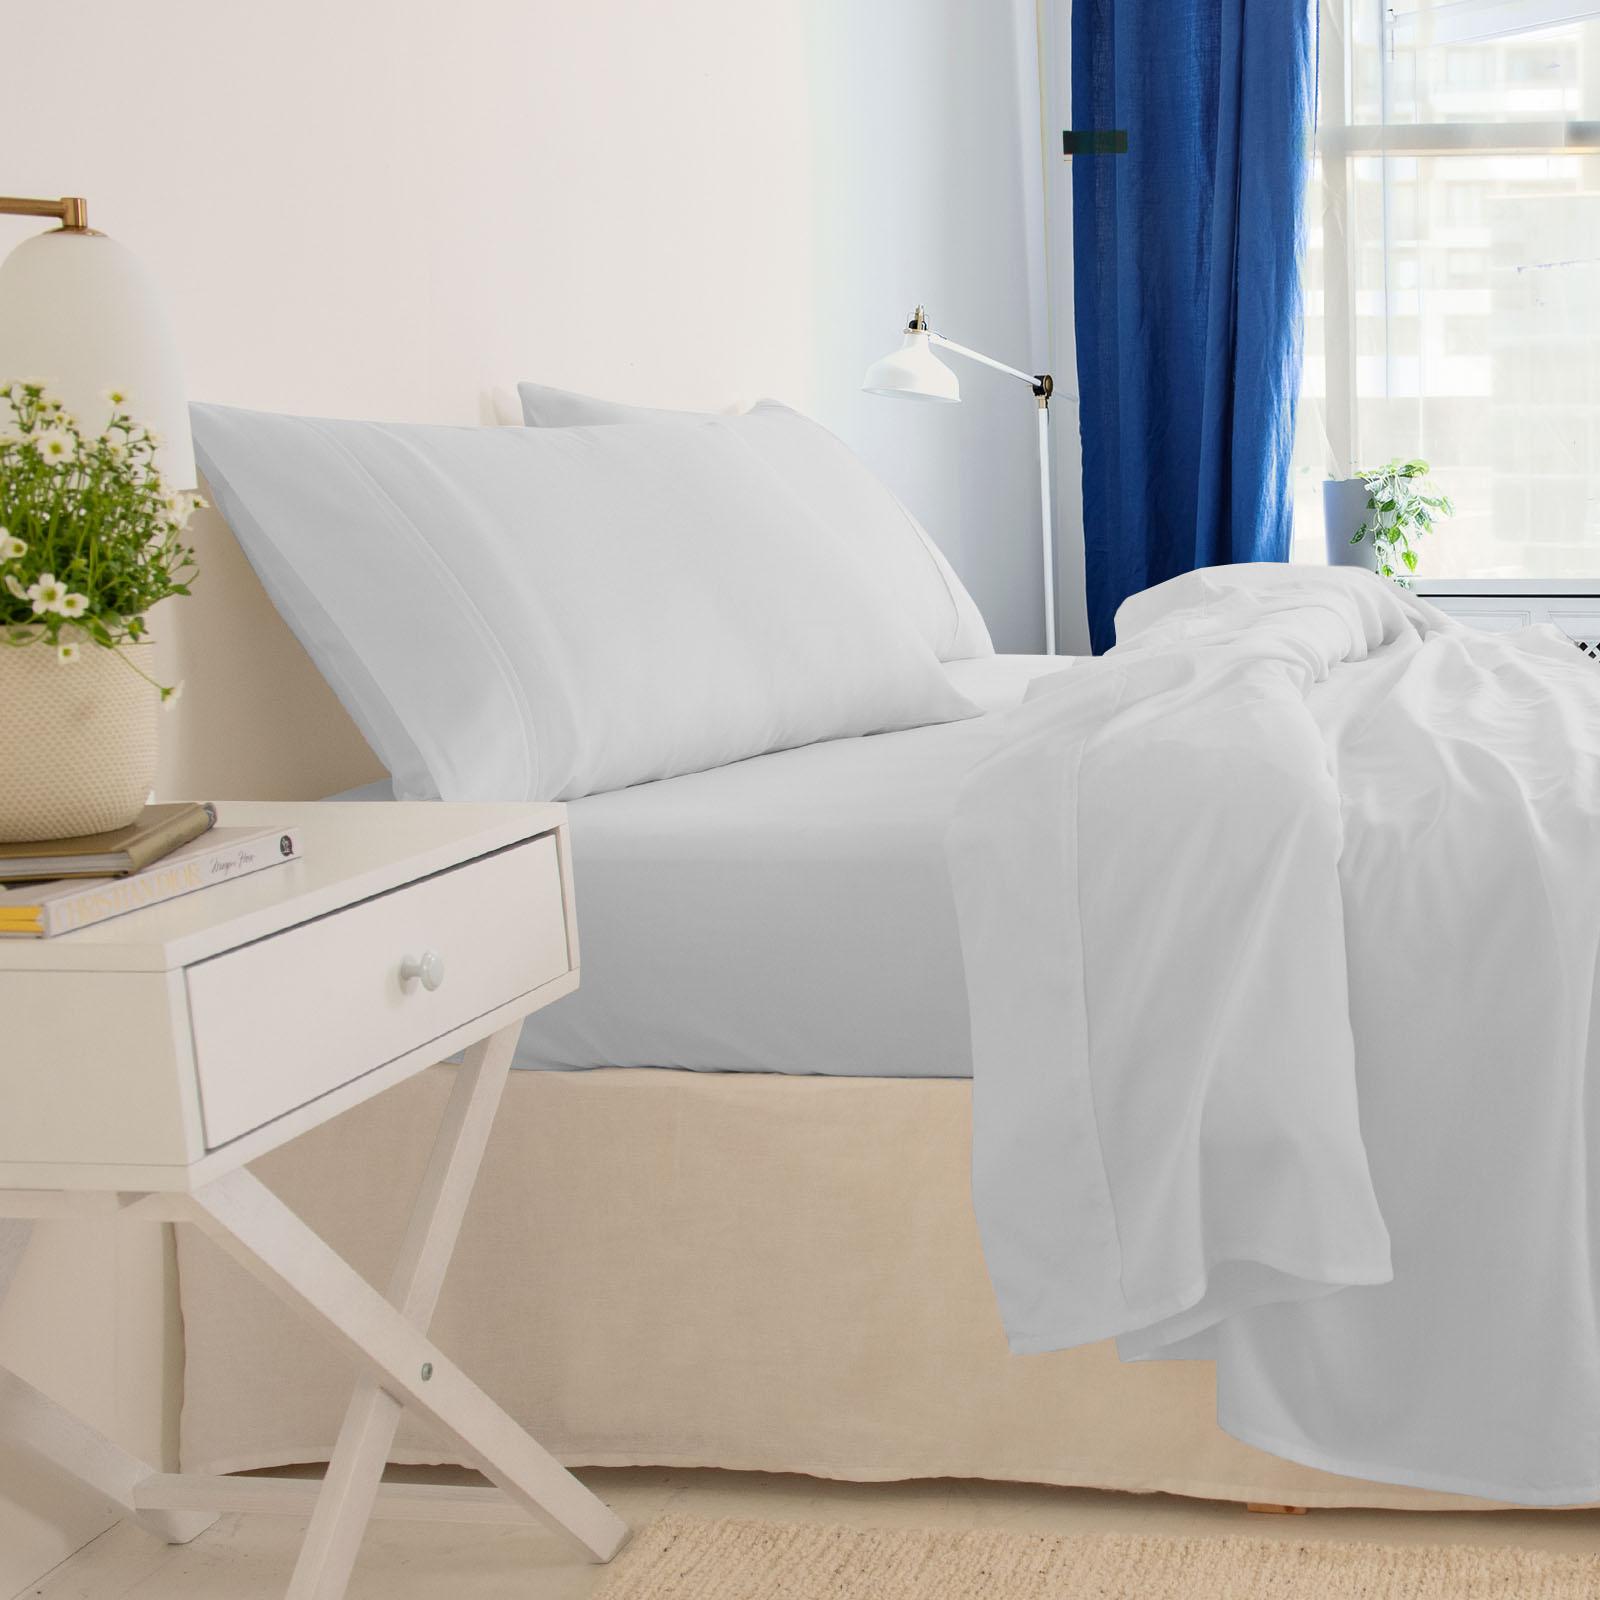 thumbnail 41 - Royal Comfort 1000TC Hotel Grade Bamboo Cotton Sheets Pillowcases Set Ultrasoft